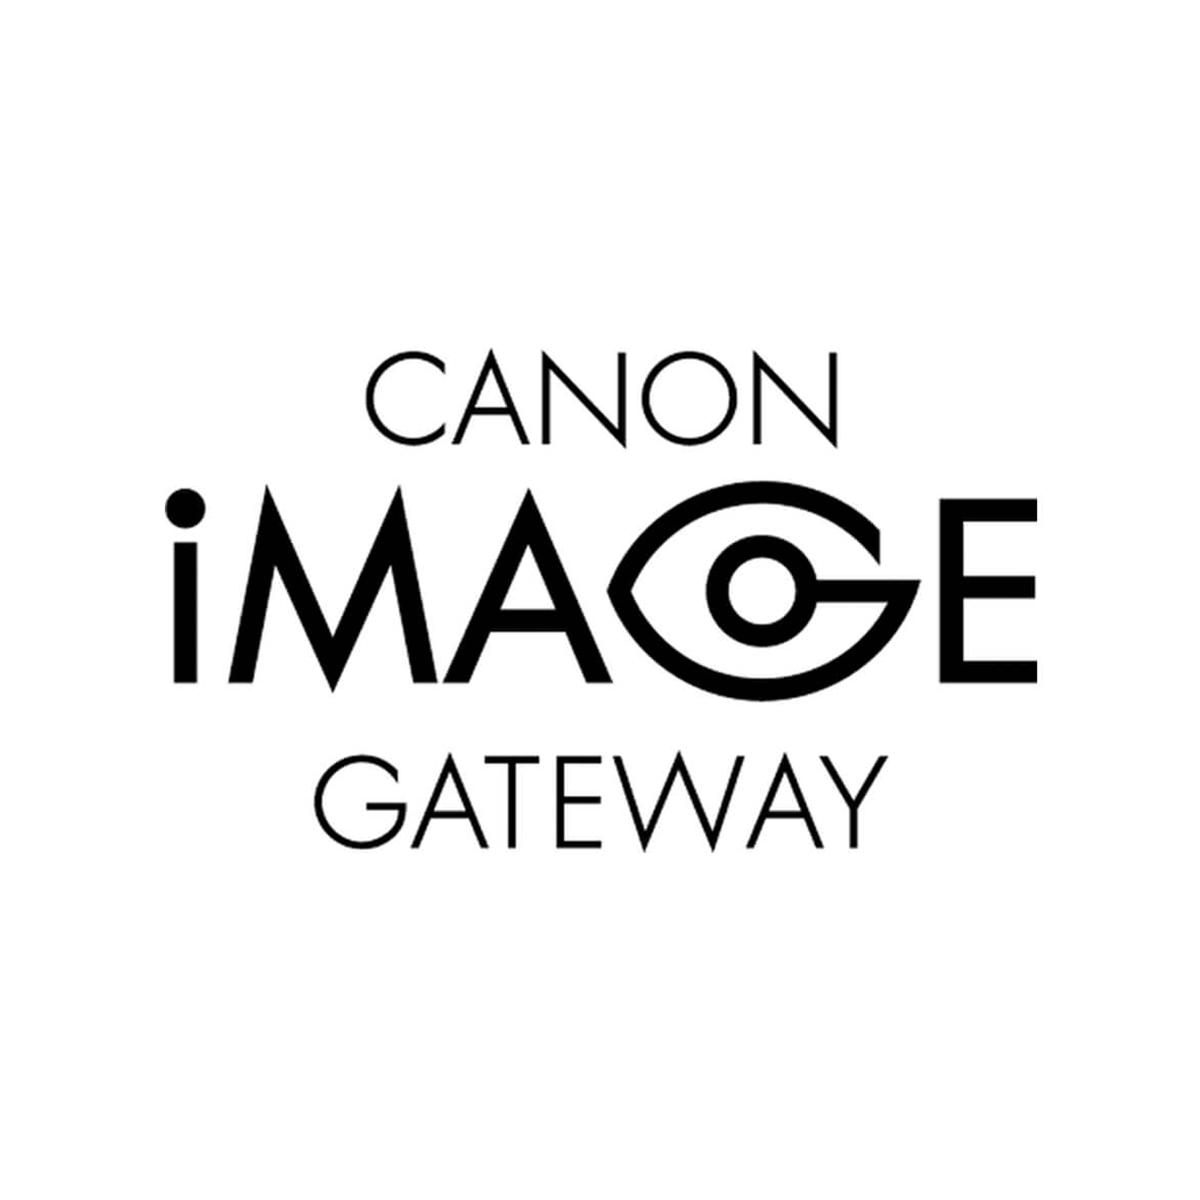 Canon Image Gateway